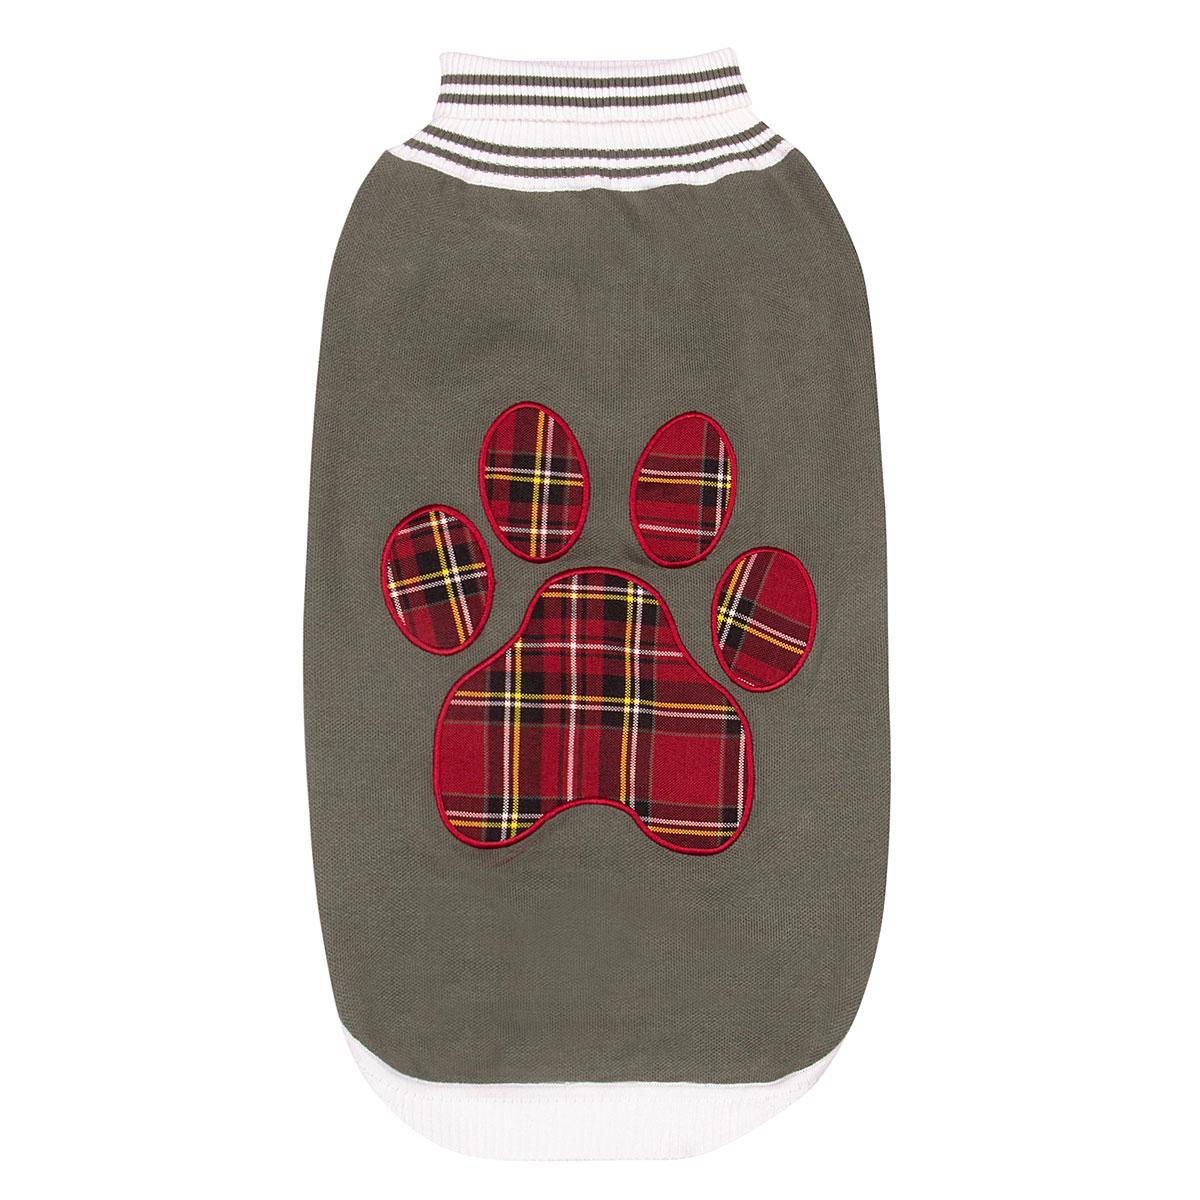 Halo Ec Rot Rot Rot Plaid Hunde Pfote Pullover  | Moderne und elegante Mode  f59b50